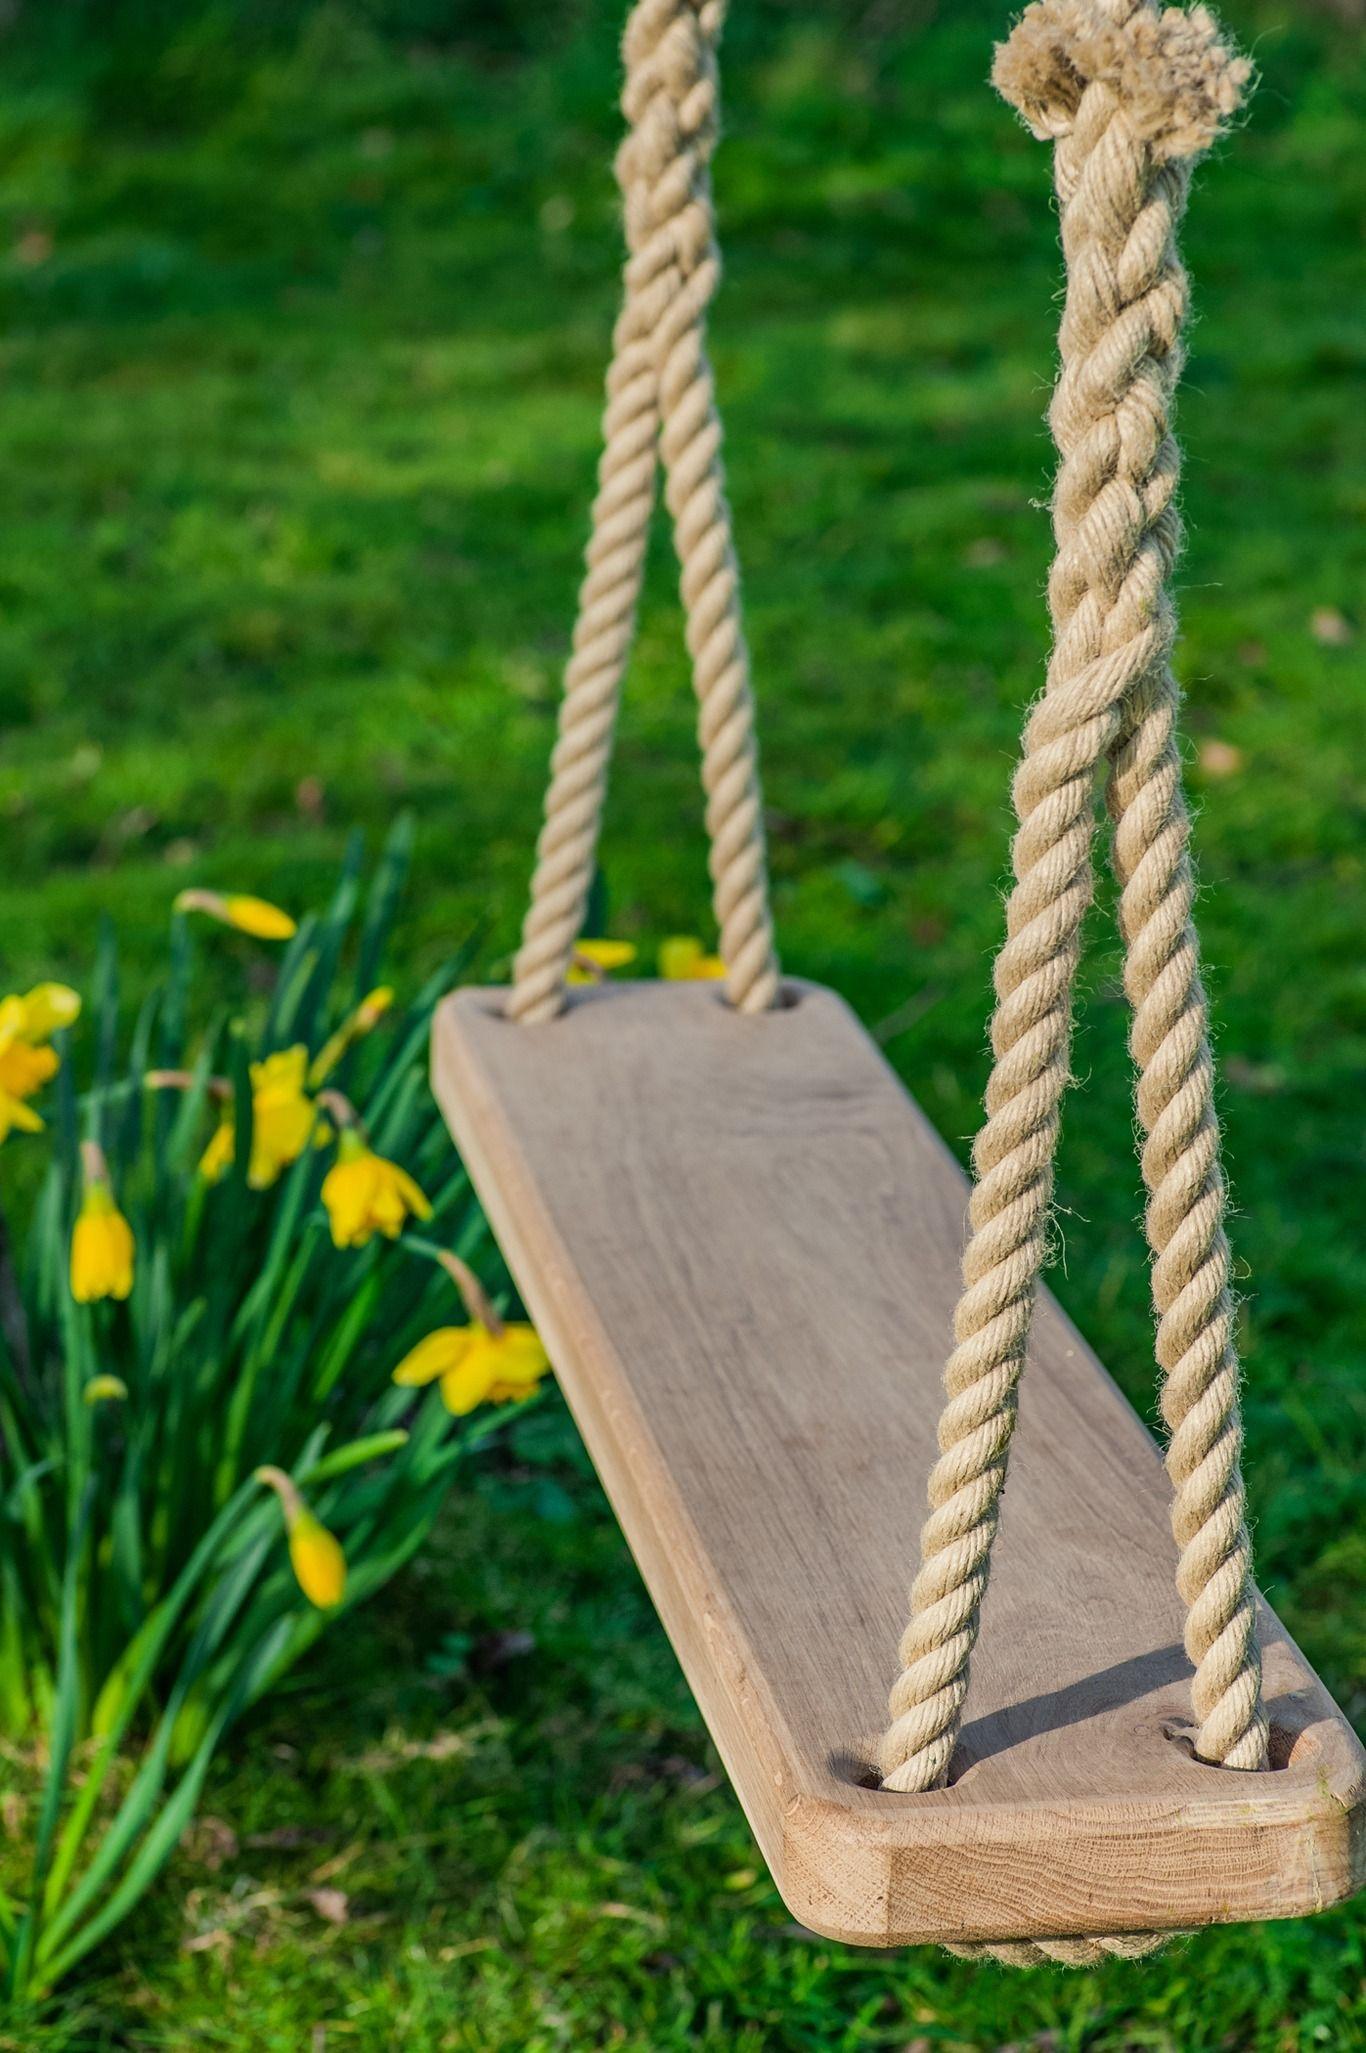 JC Gardens and Climbing Frames custom build amazing bespoke wooden ...